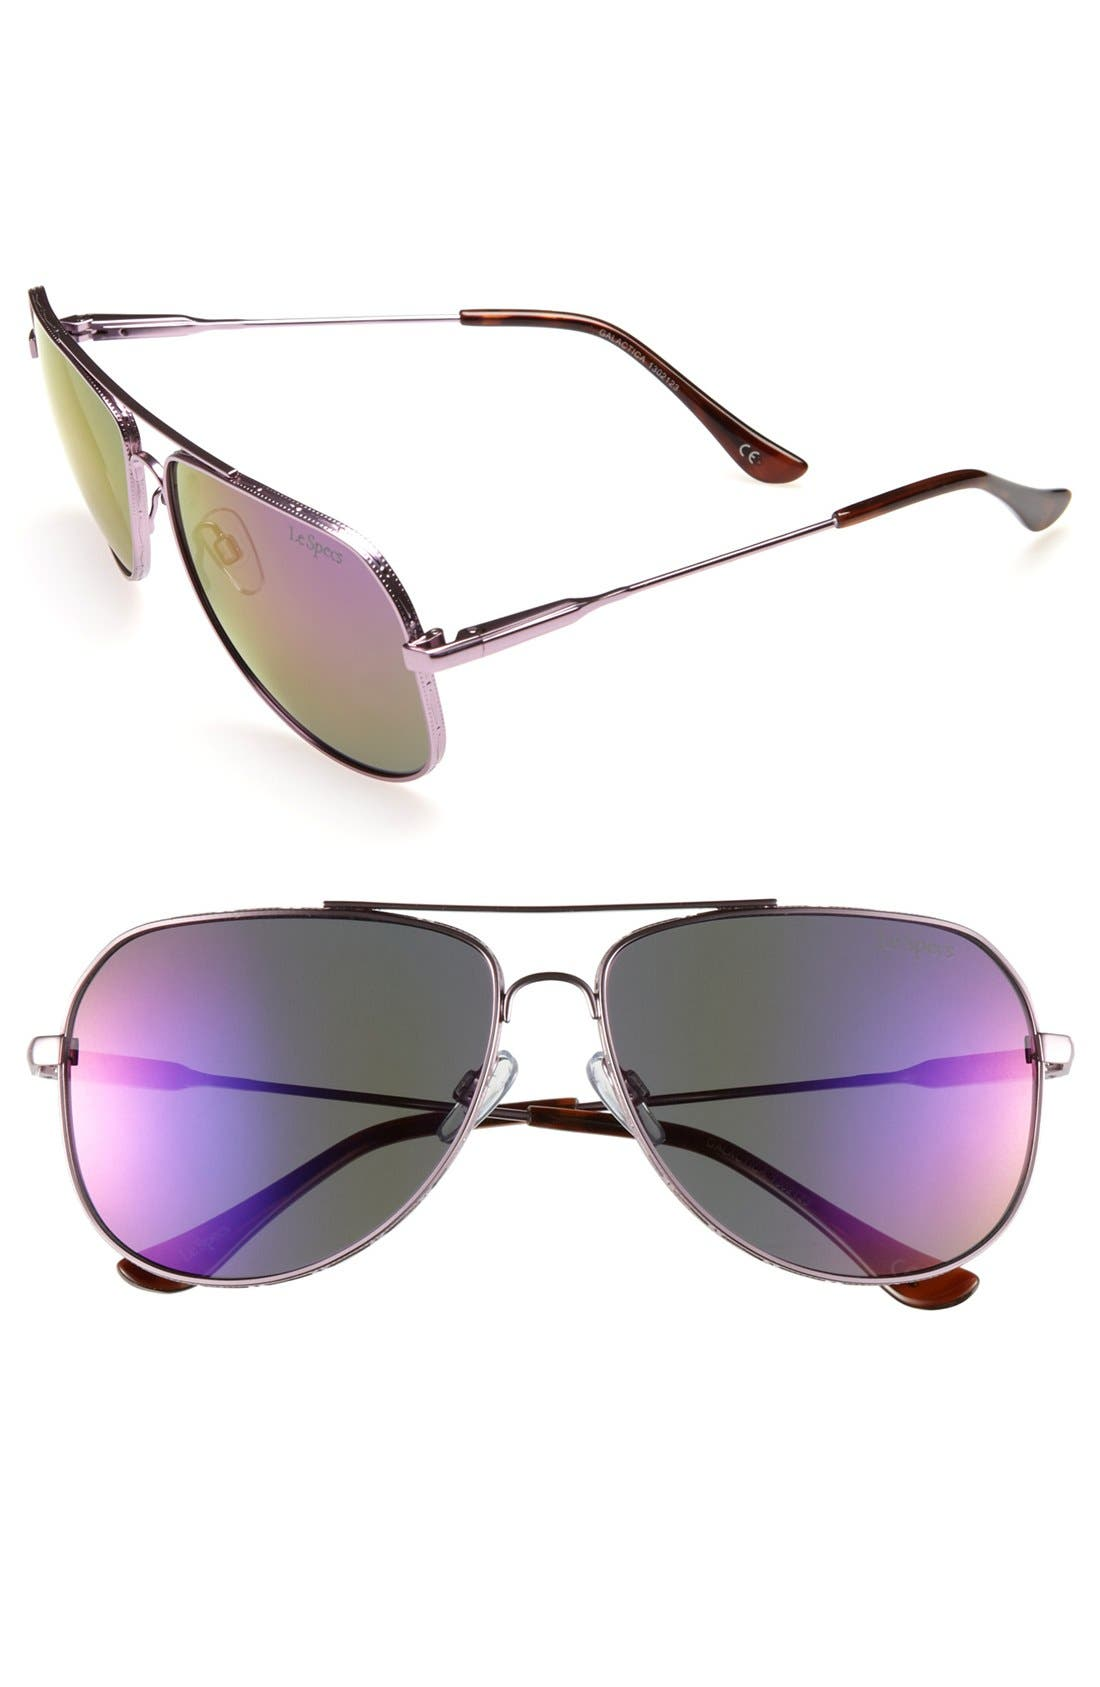 Alternate Image 1 Selected - Le Specs 'Galactica' Aviator Sunglasses